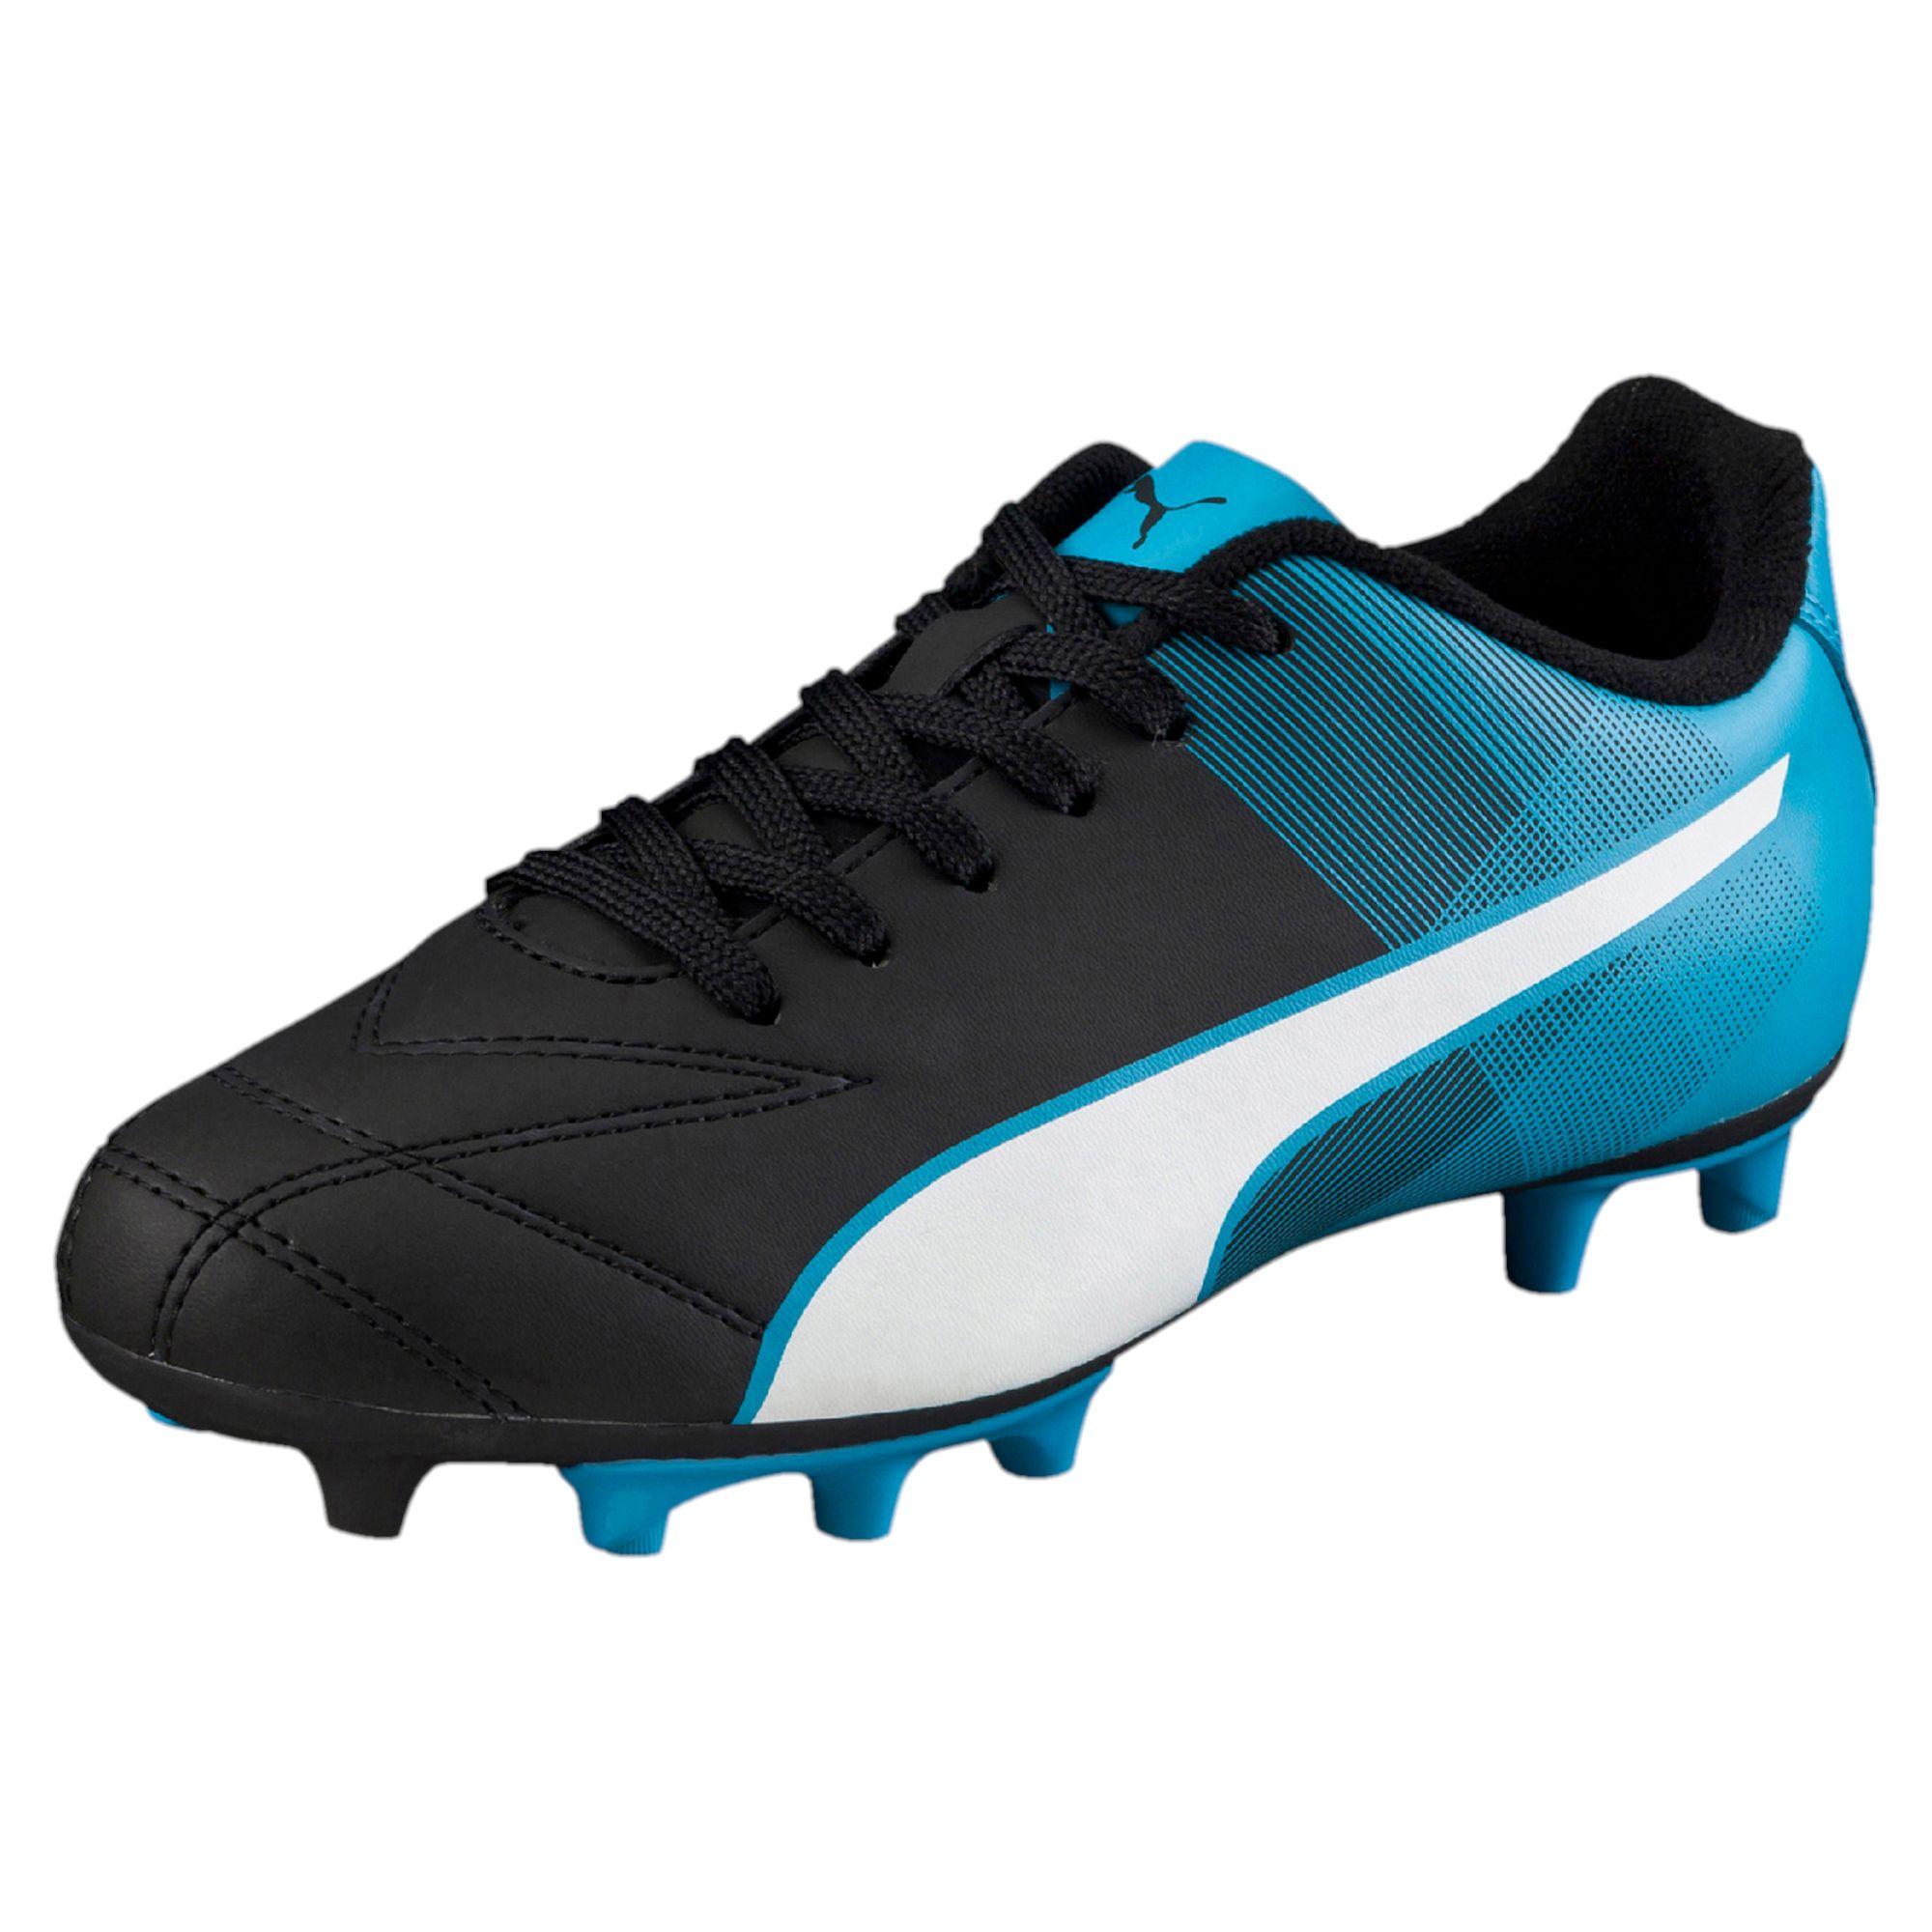 blue puma soccer cleats